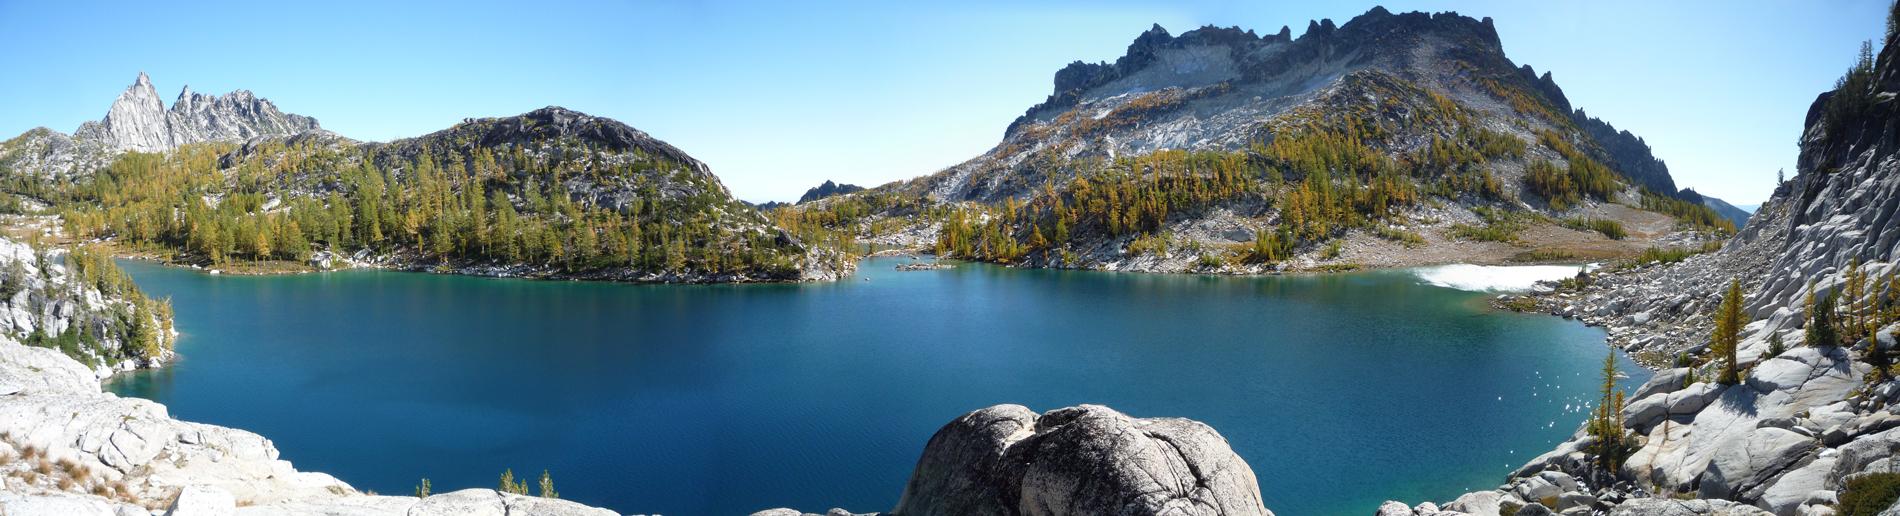 Pano of Perfection Lake